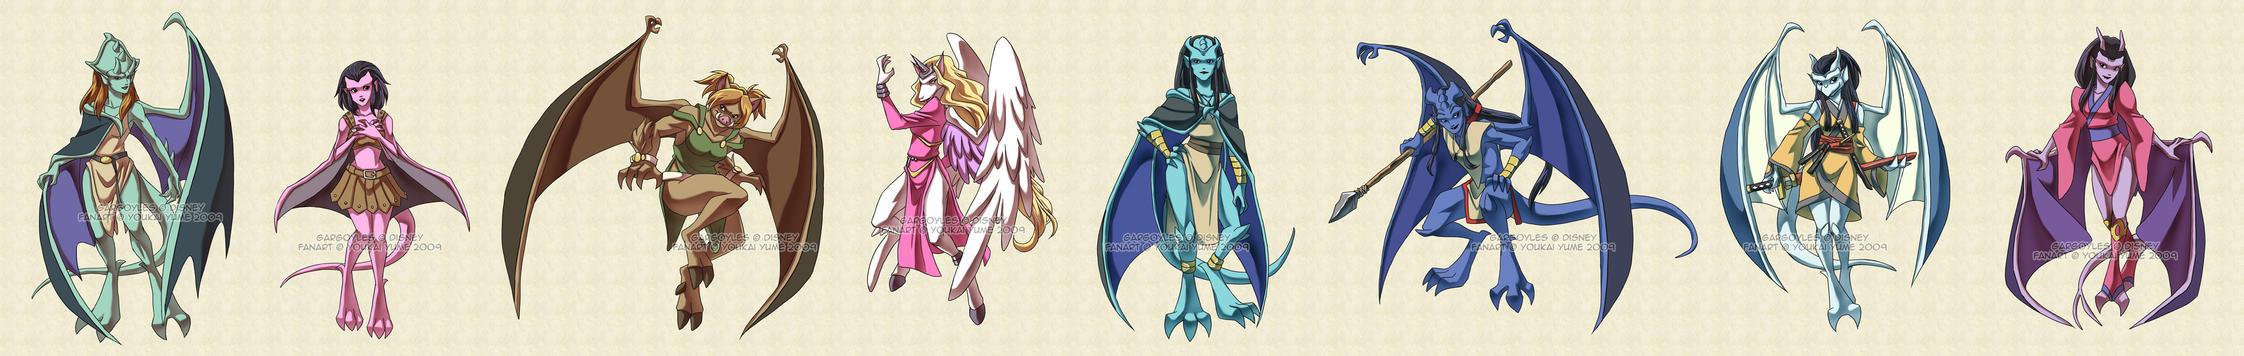 Gargoyles: Gar-girls 2 by YoukaiYume